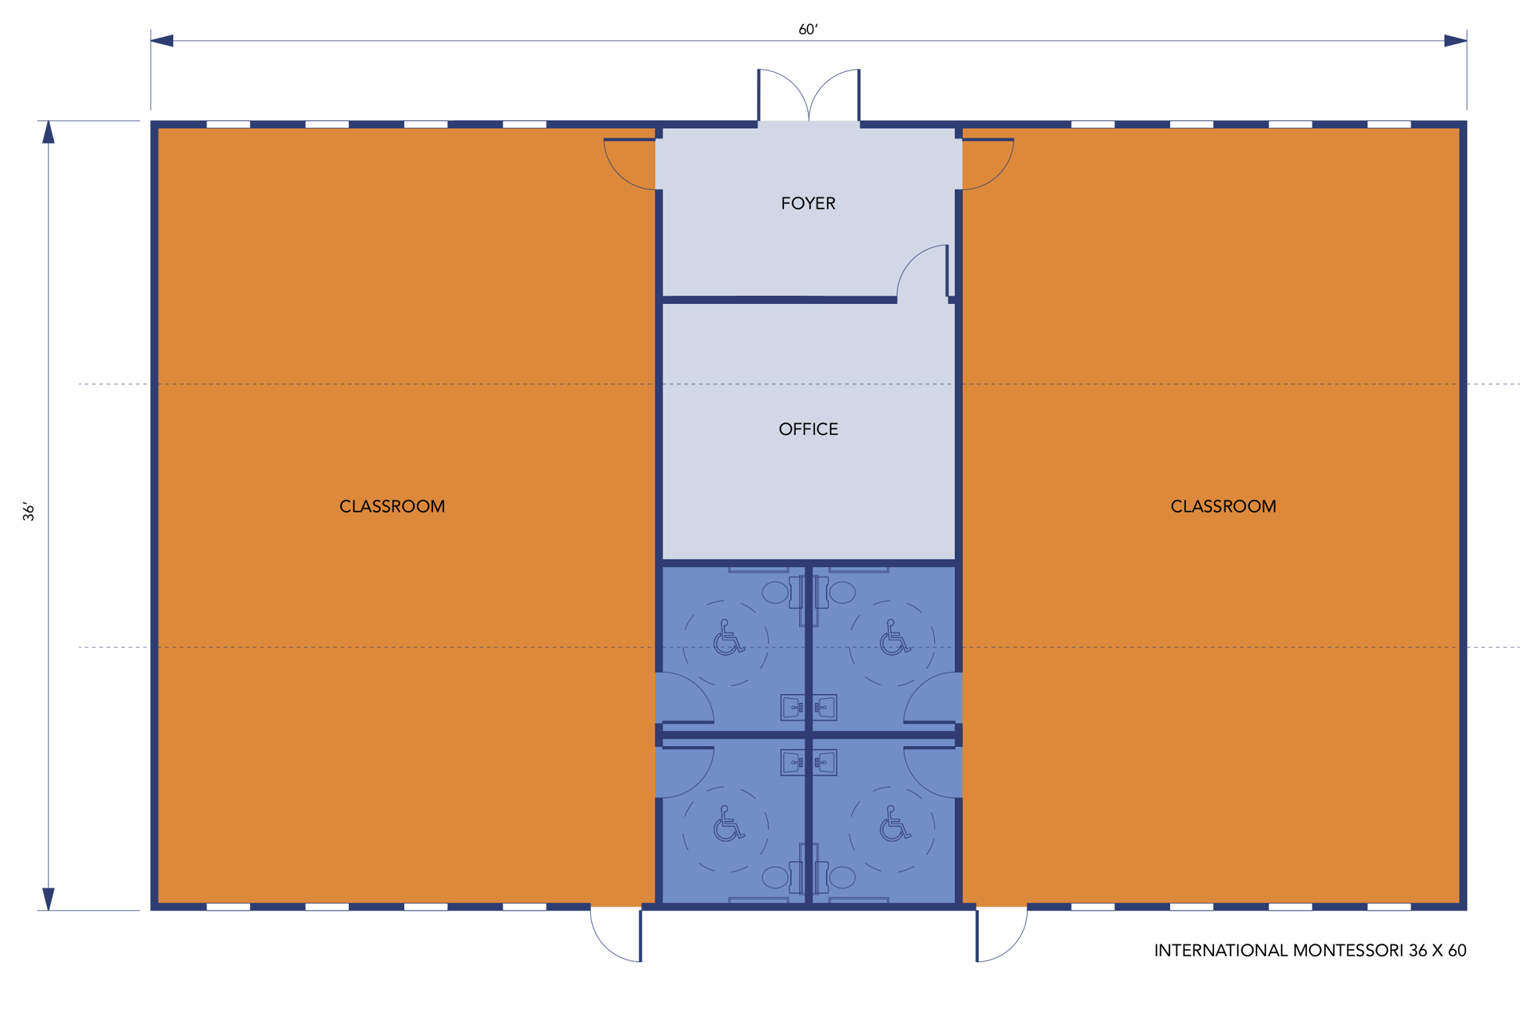 Multi-Classroom Modular Classroom building floorplan